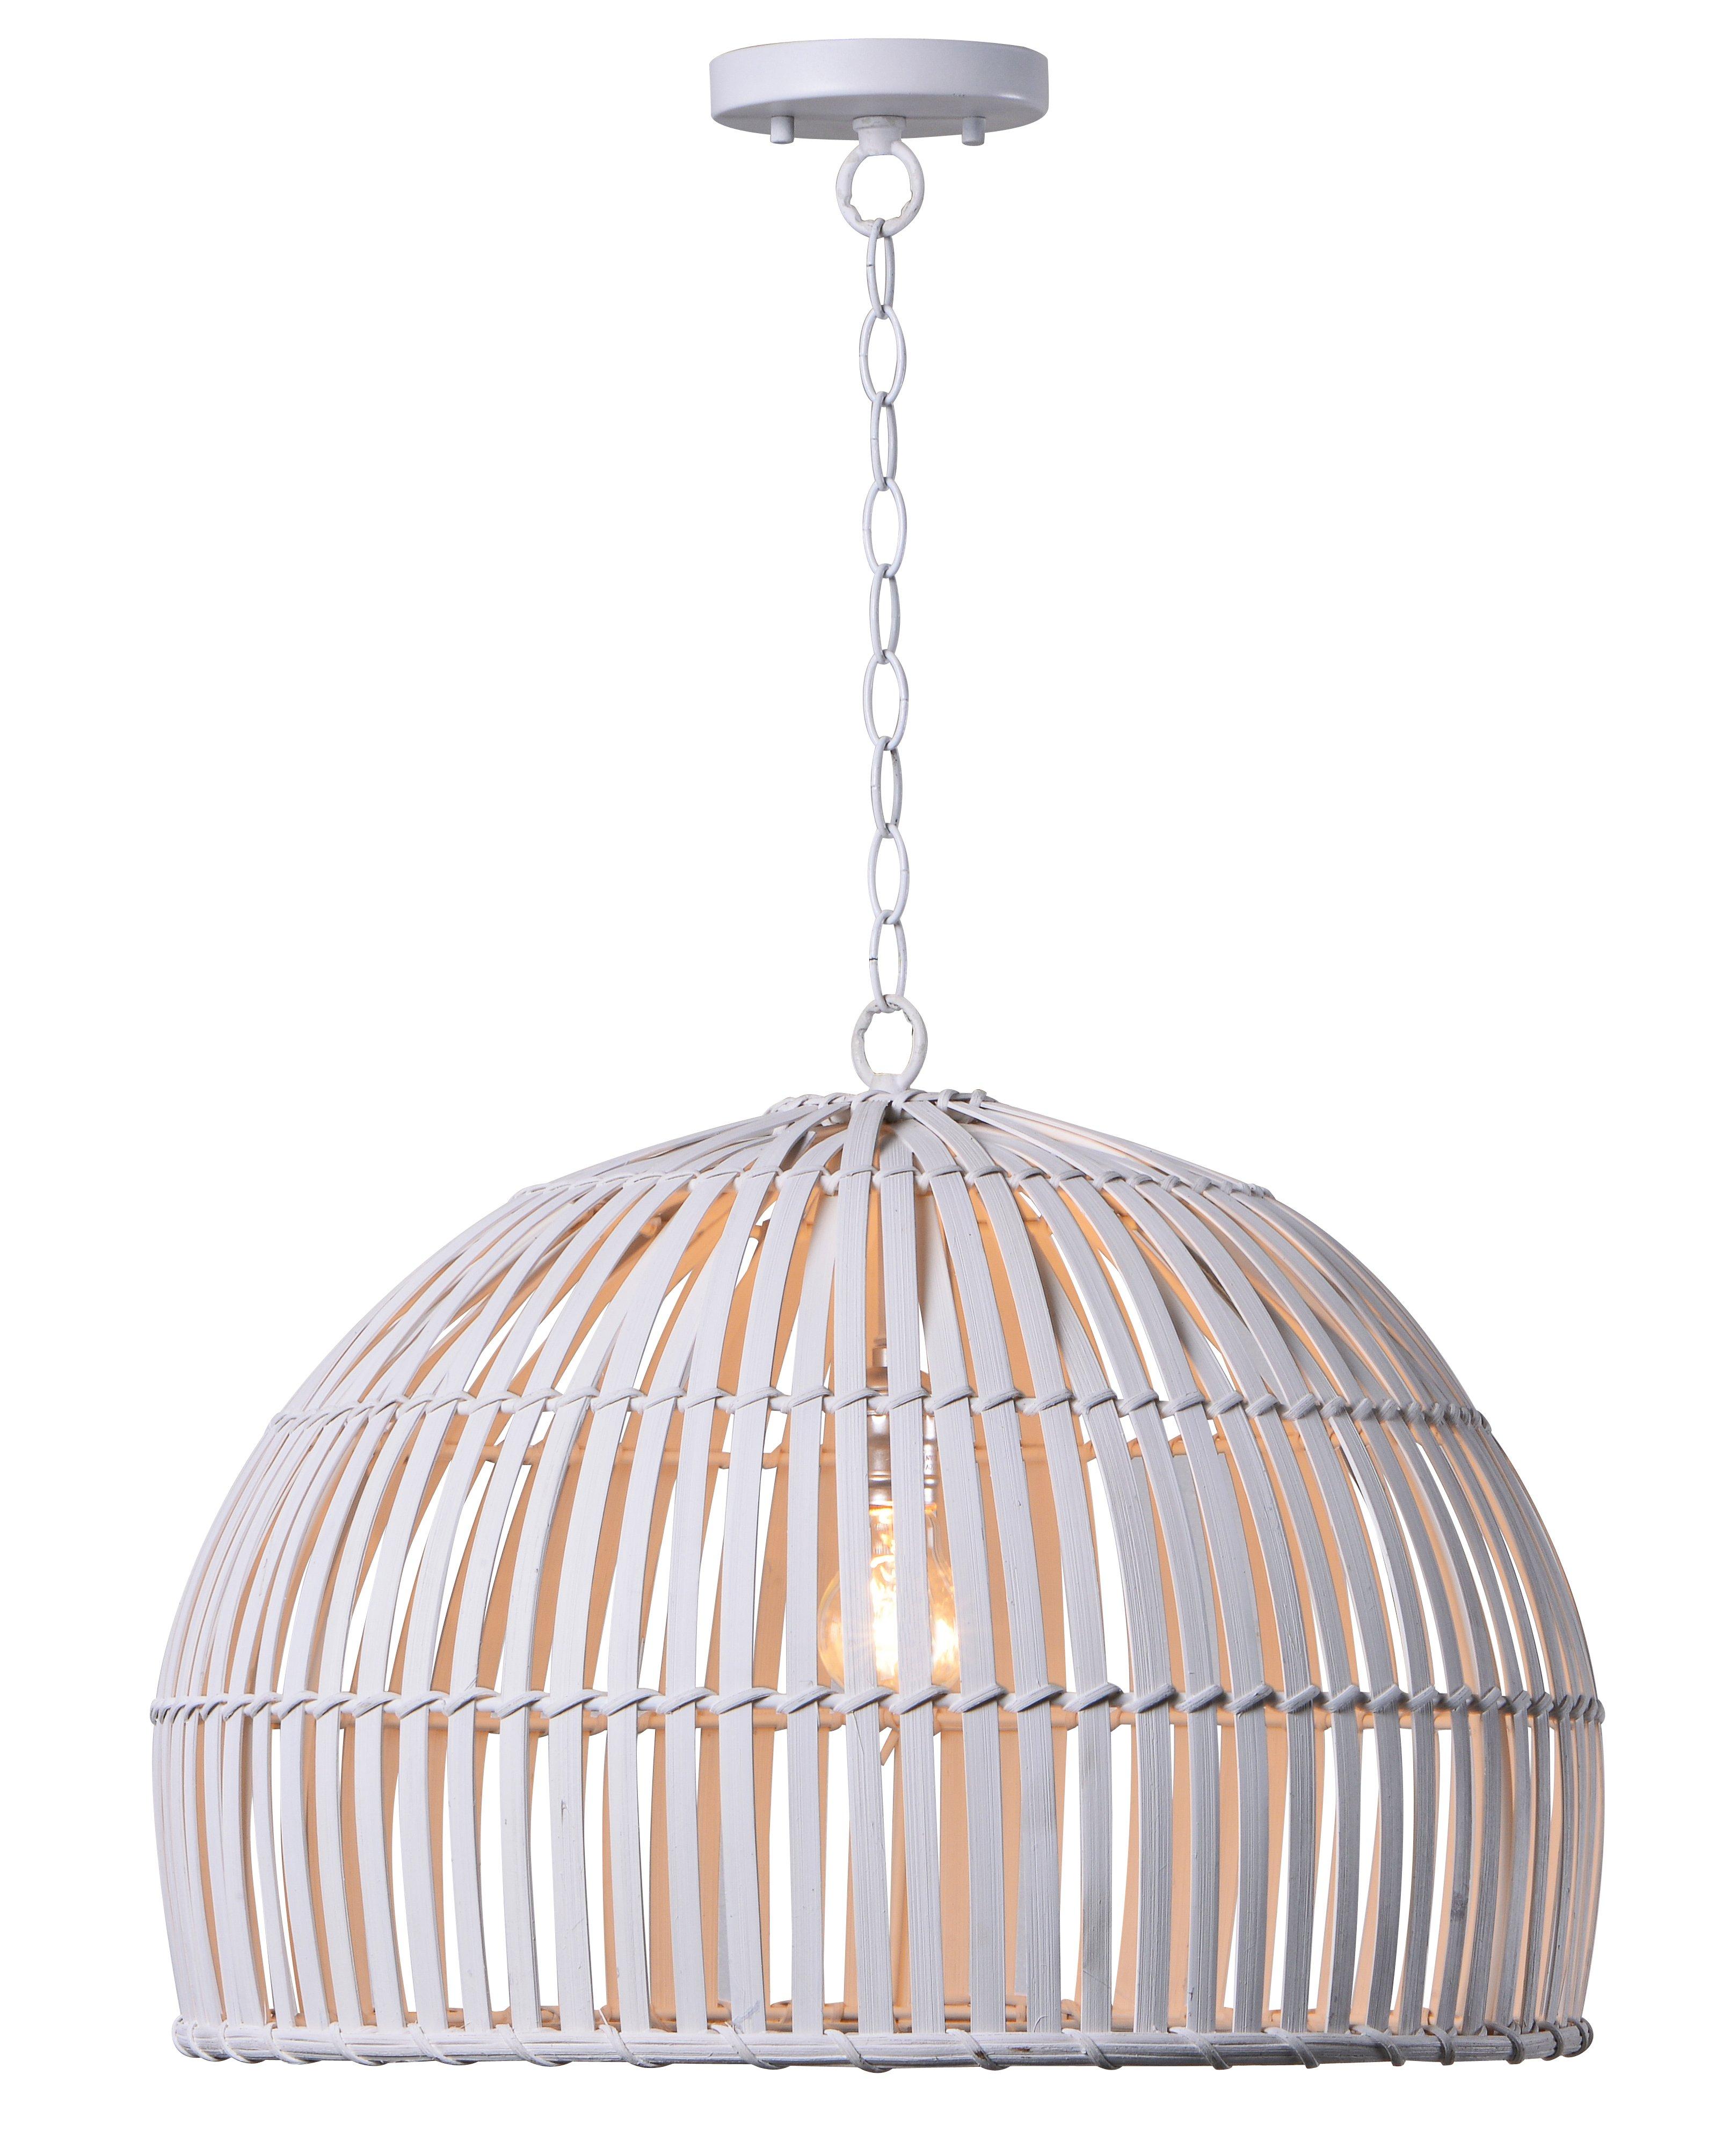 Delmore 1-Light Single Dome Pendant & Reviews | Joss & Main with Granville 2-Light Single Dome Pendants (Image 8 of 30)